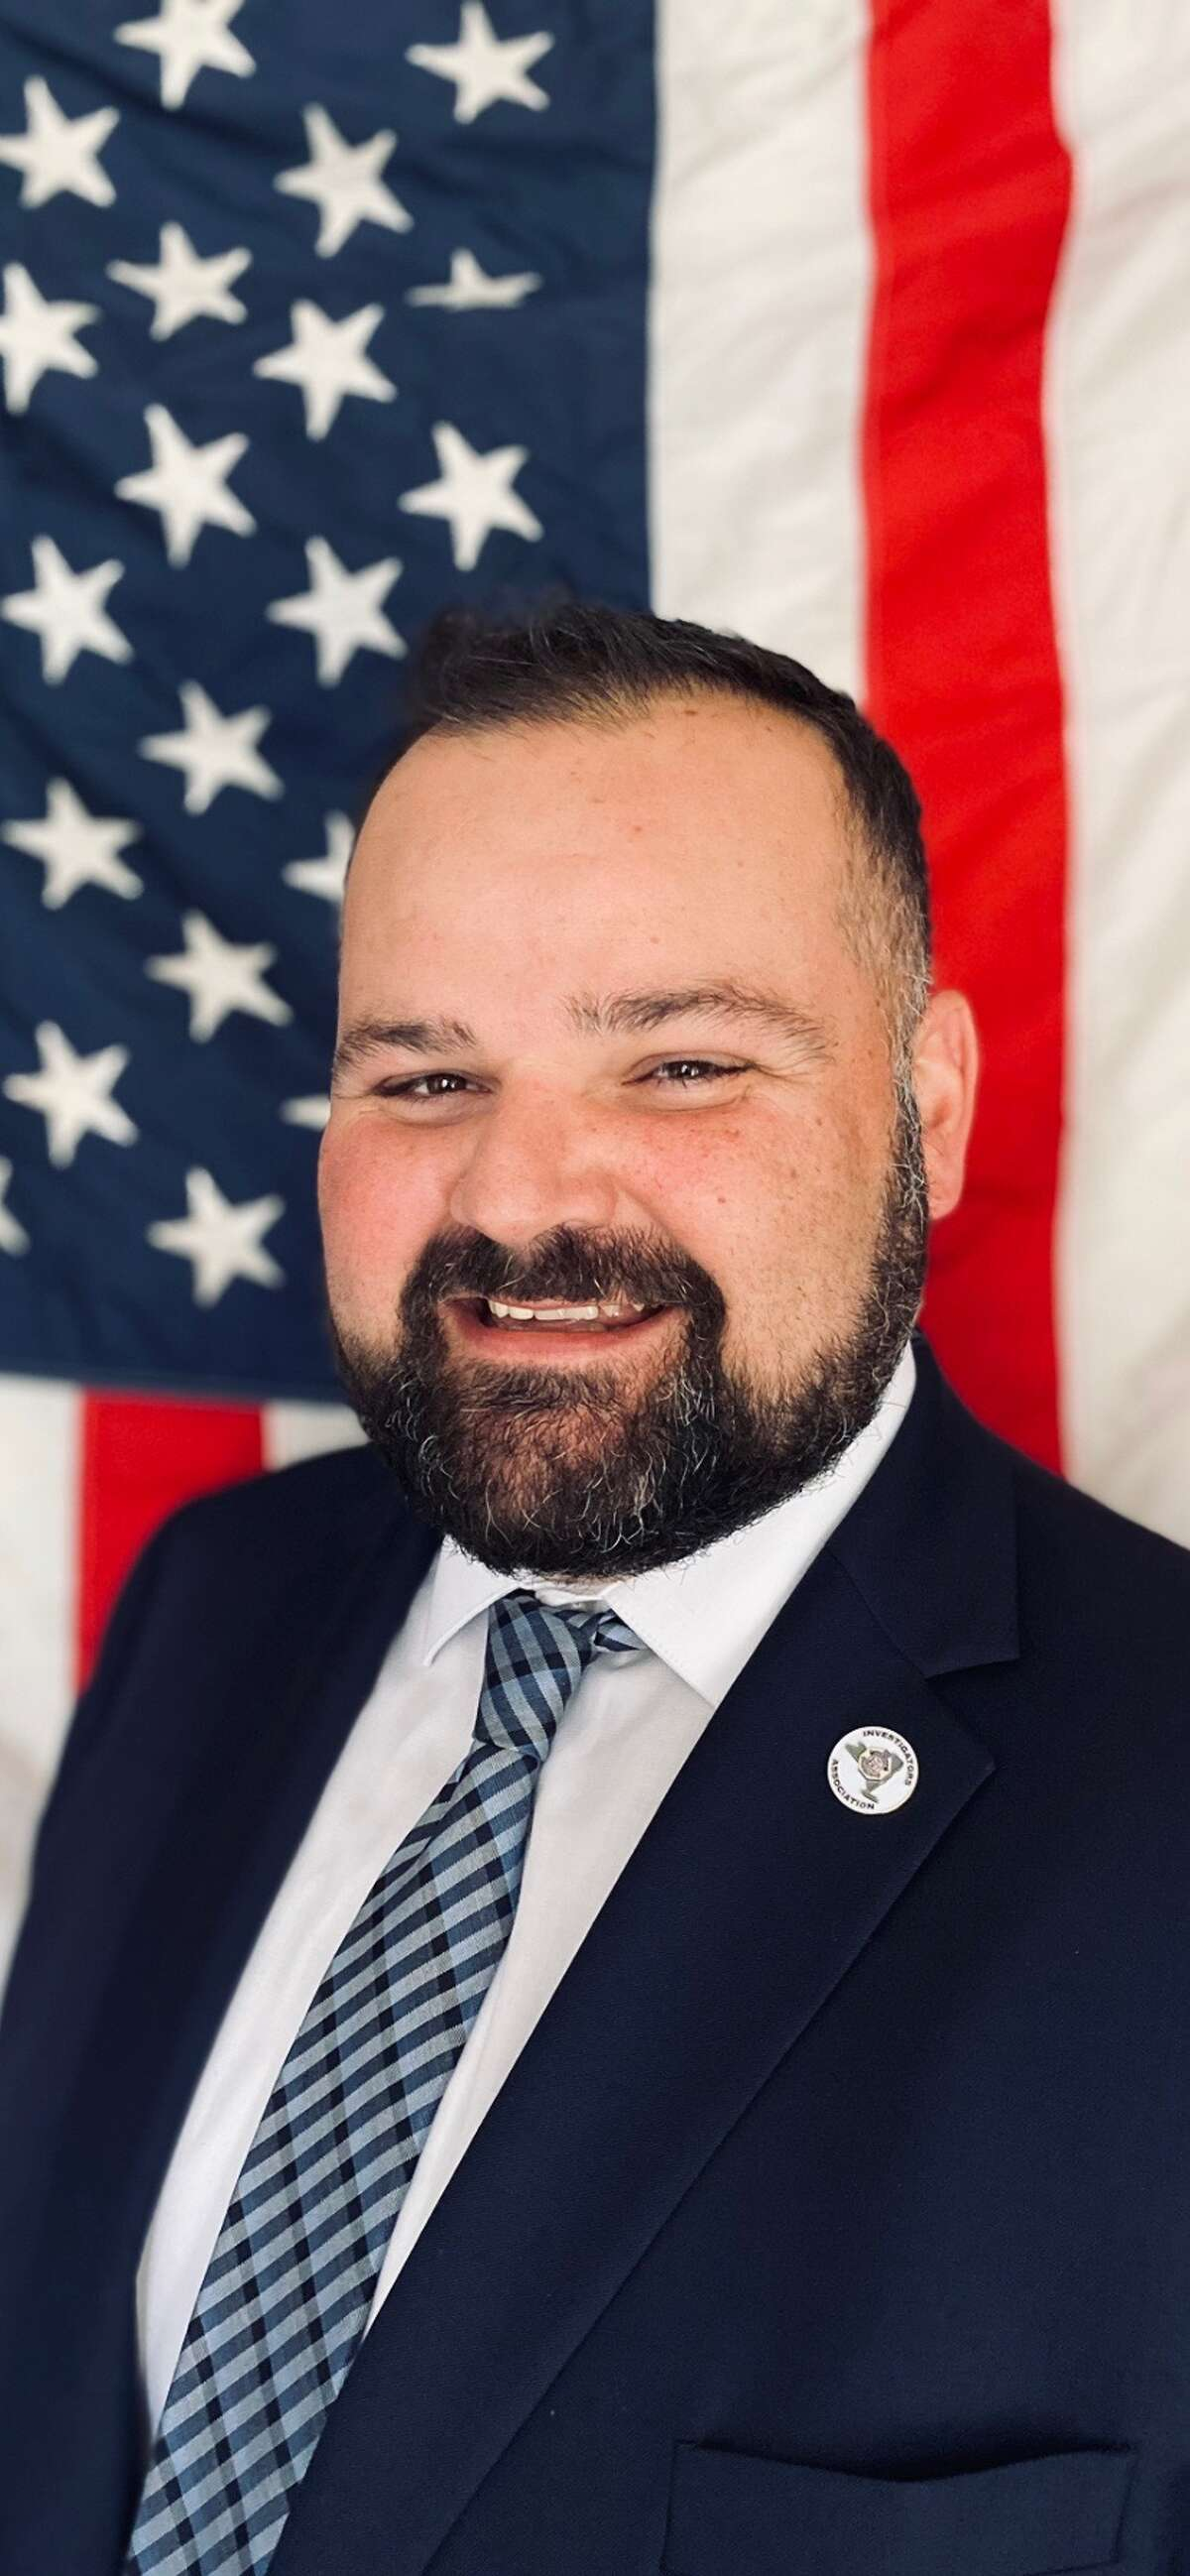 Senior Investigator Timothy Dymond, president of the New York State Police Investigators Association.